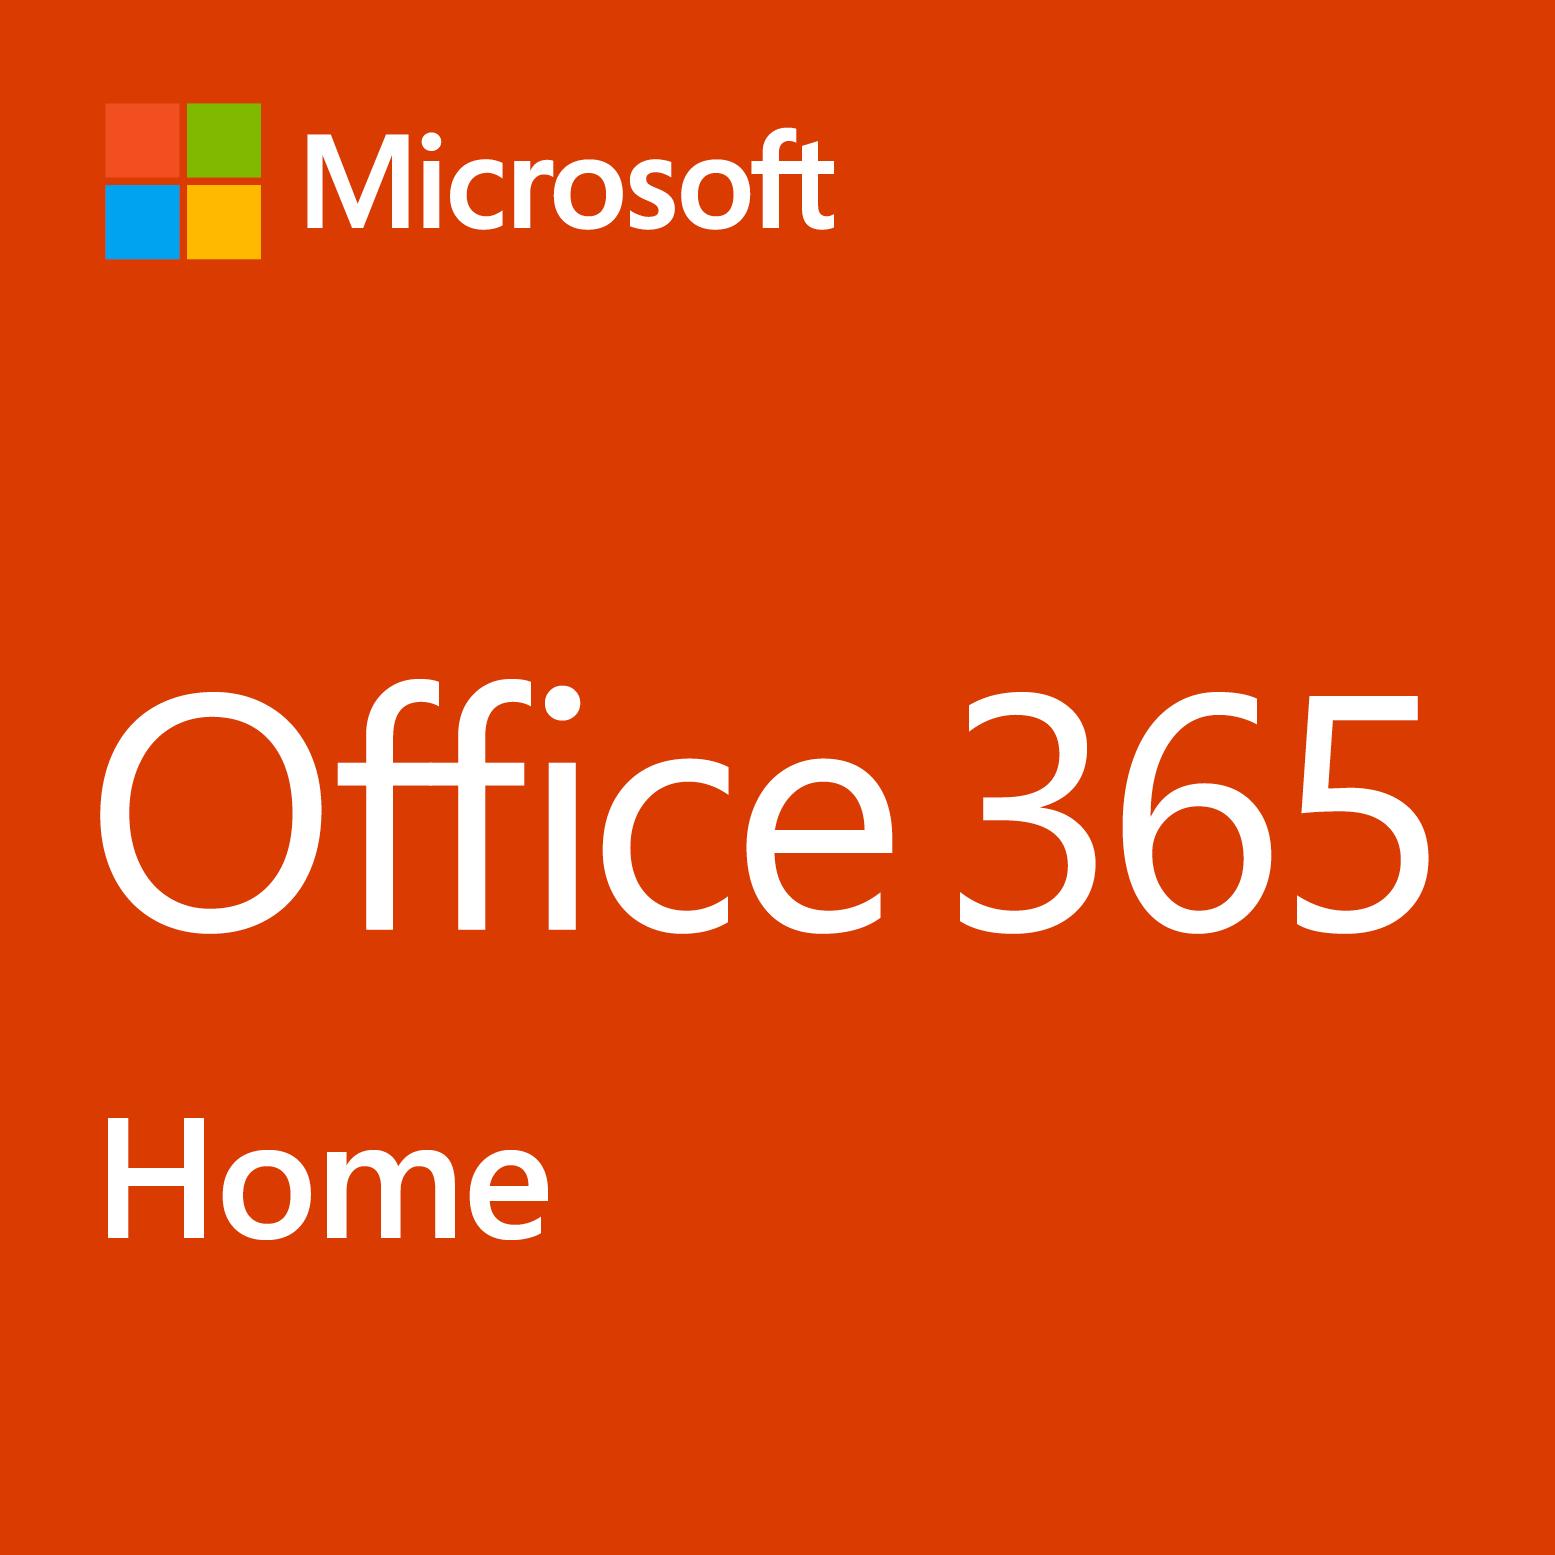 microsoft office 365 home. office 365 home word microsoft c